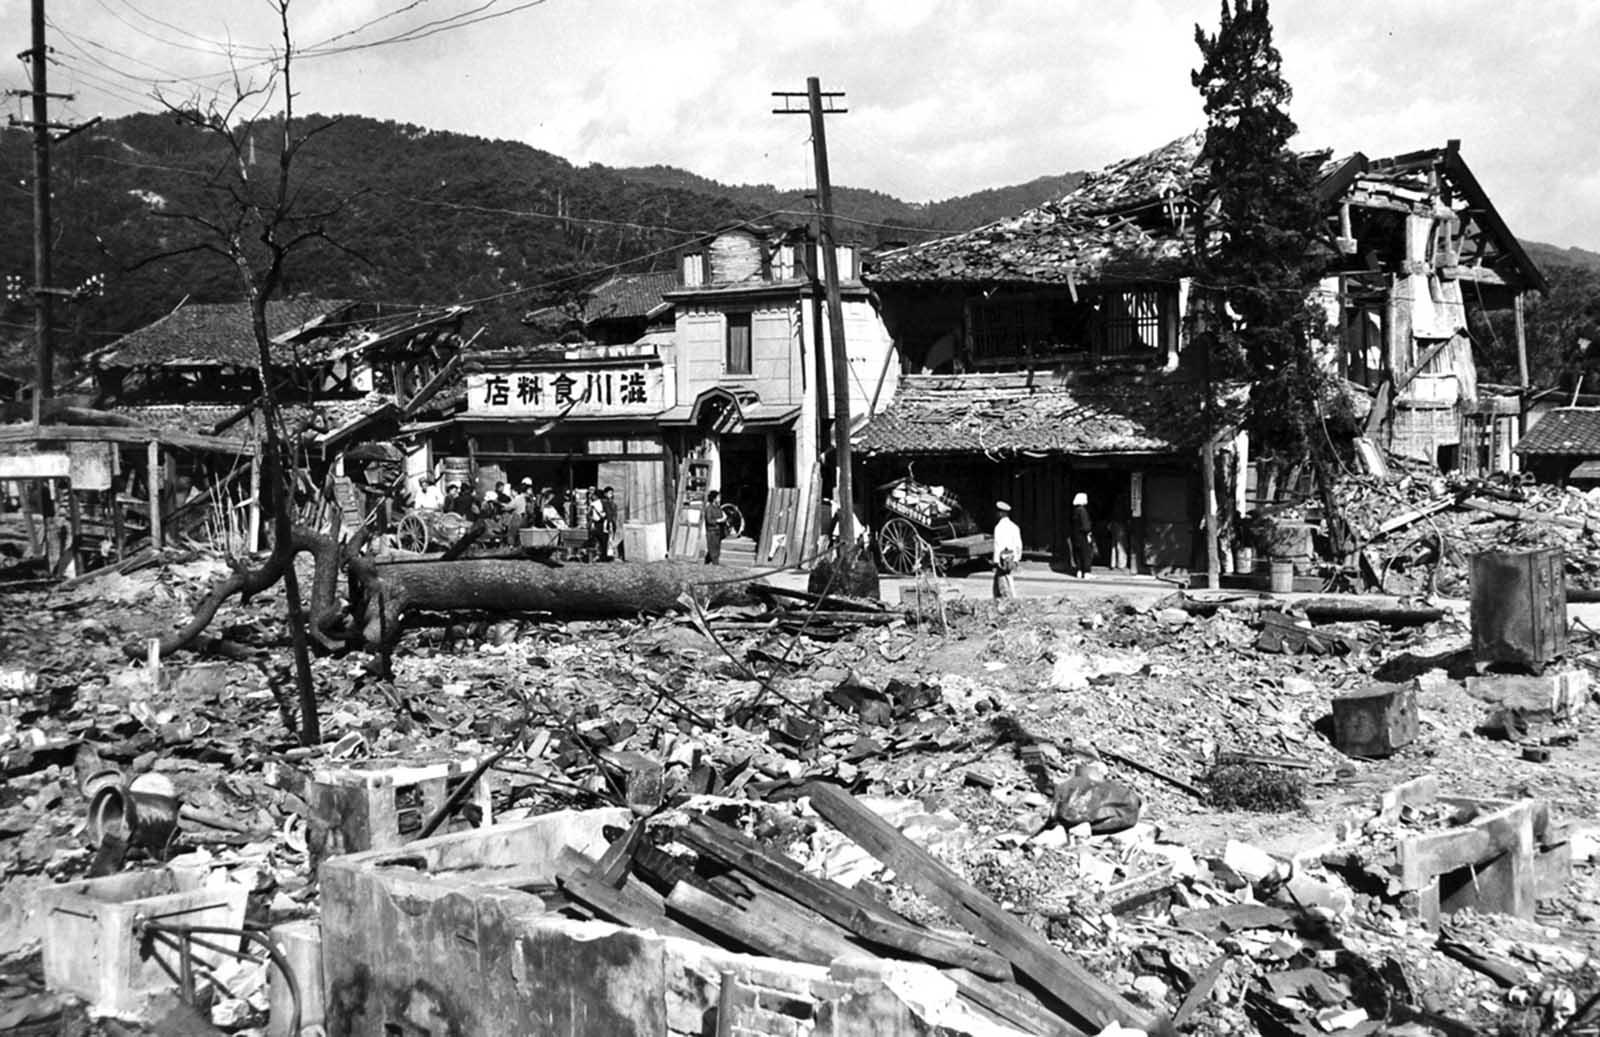 Hiroshima after the bombing.